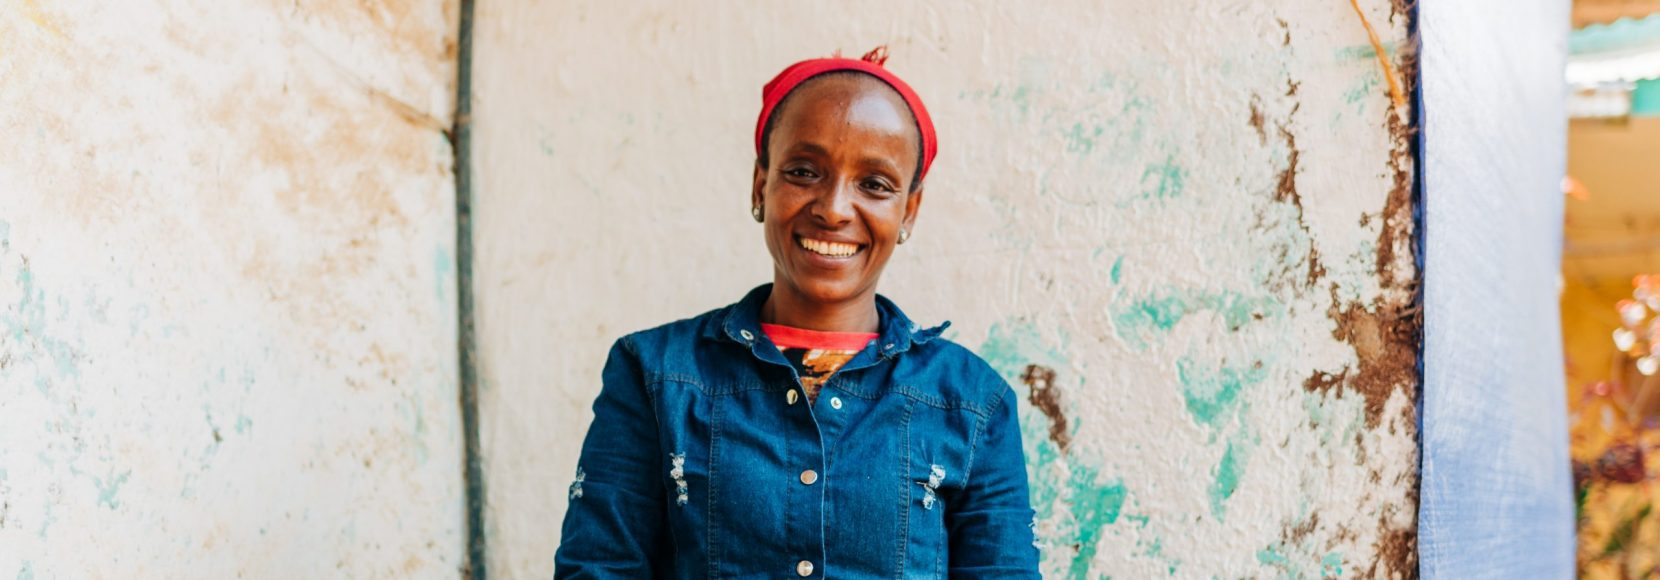 Meet 5 inspiring Women Leaders